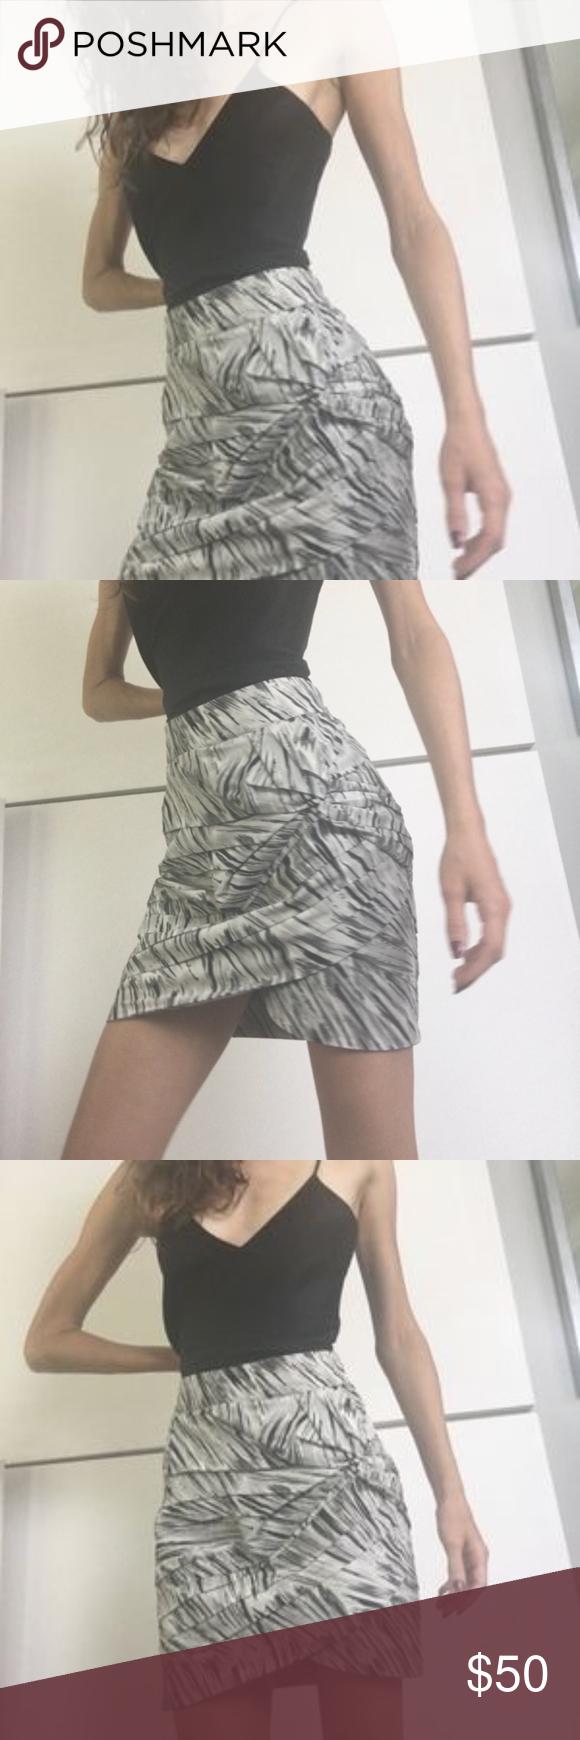 Leifsdottir Mini Skirt Size 2 Tulip style silk Tag reads size 2. Shell 55% cotto... 1